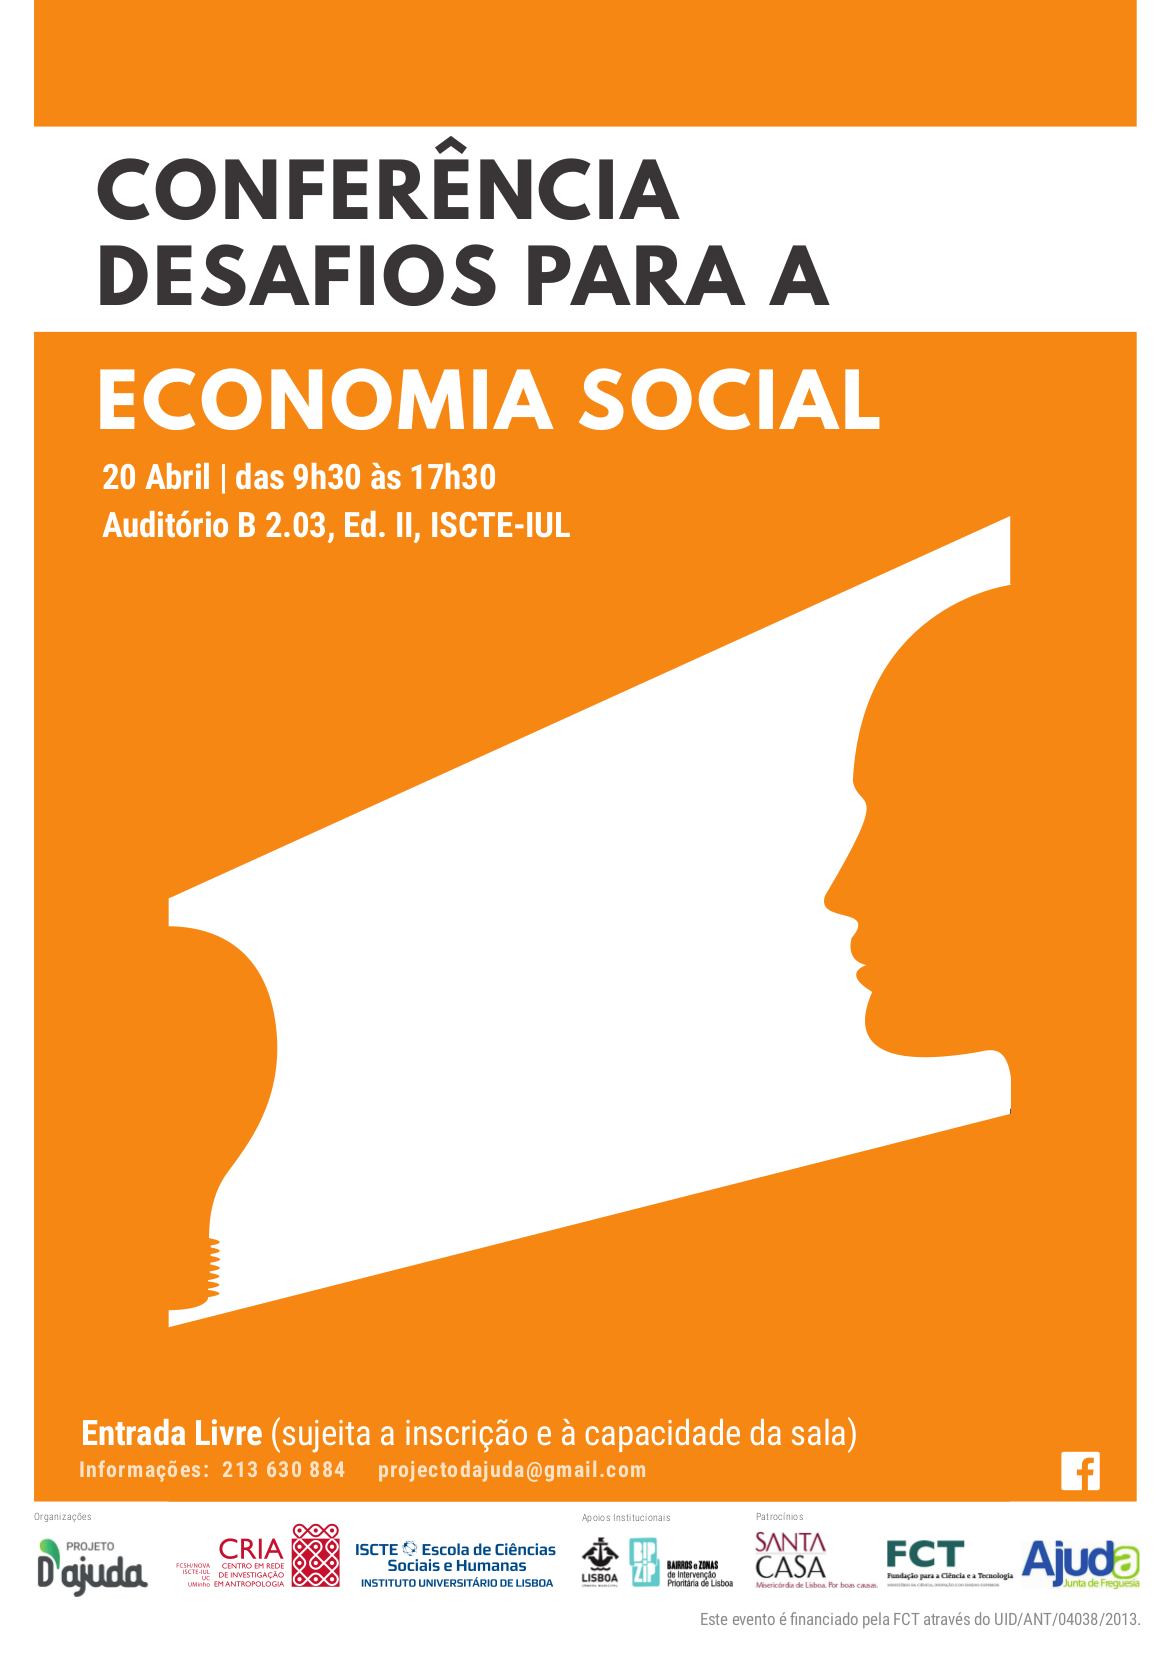 Cartaz CONFERÊNCIA DESAFIOS PARA A ECONOMIA SOCIAL